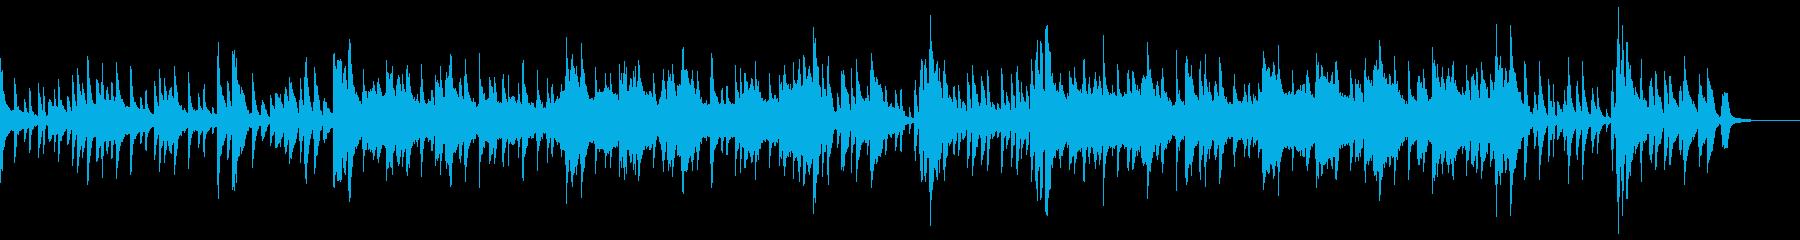 Goto3 2mixの再生済みの波形